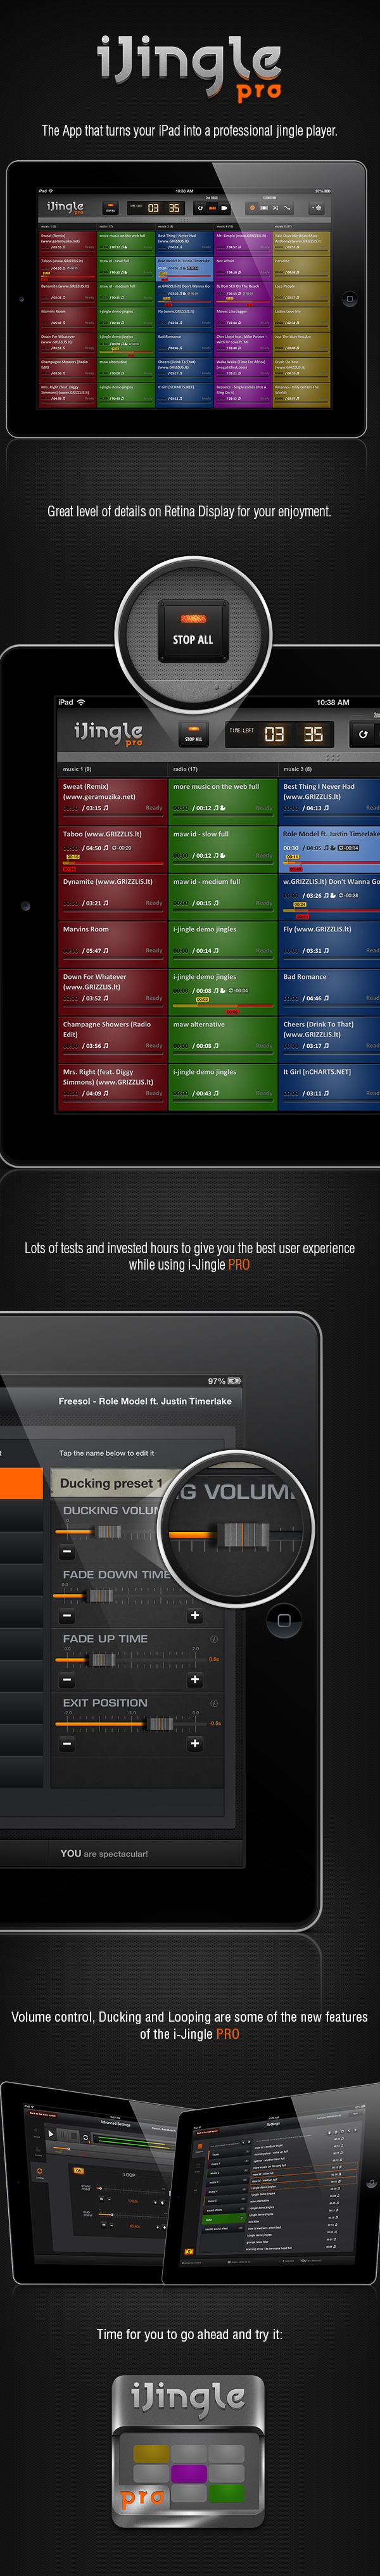 player Interface jingle UI app design Audio iPad